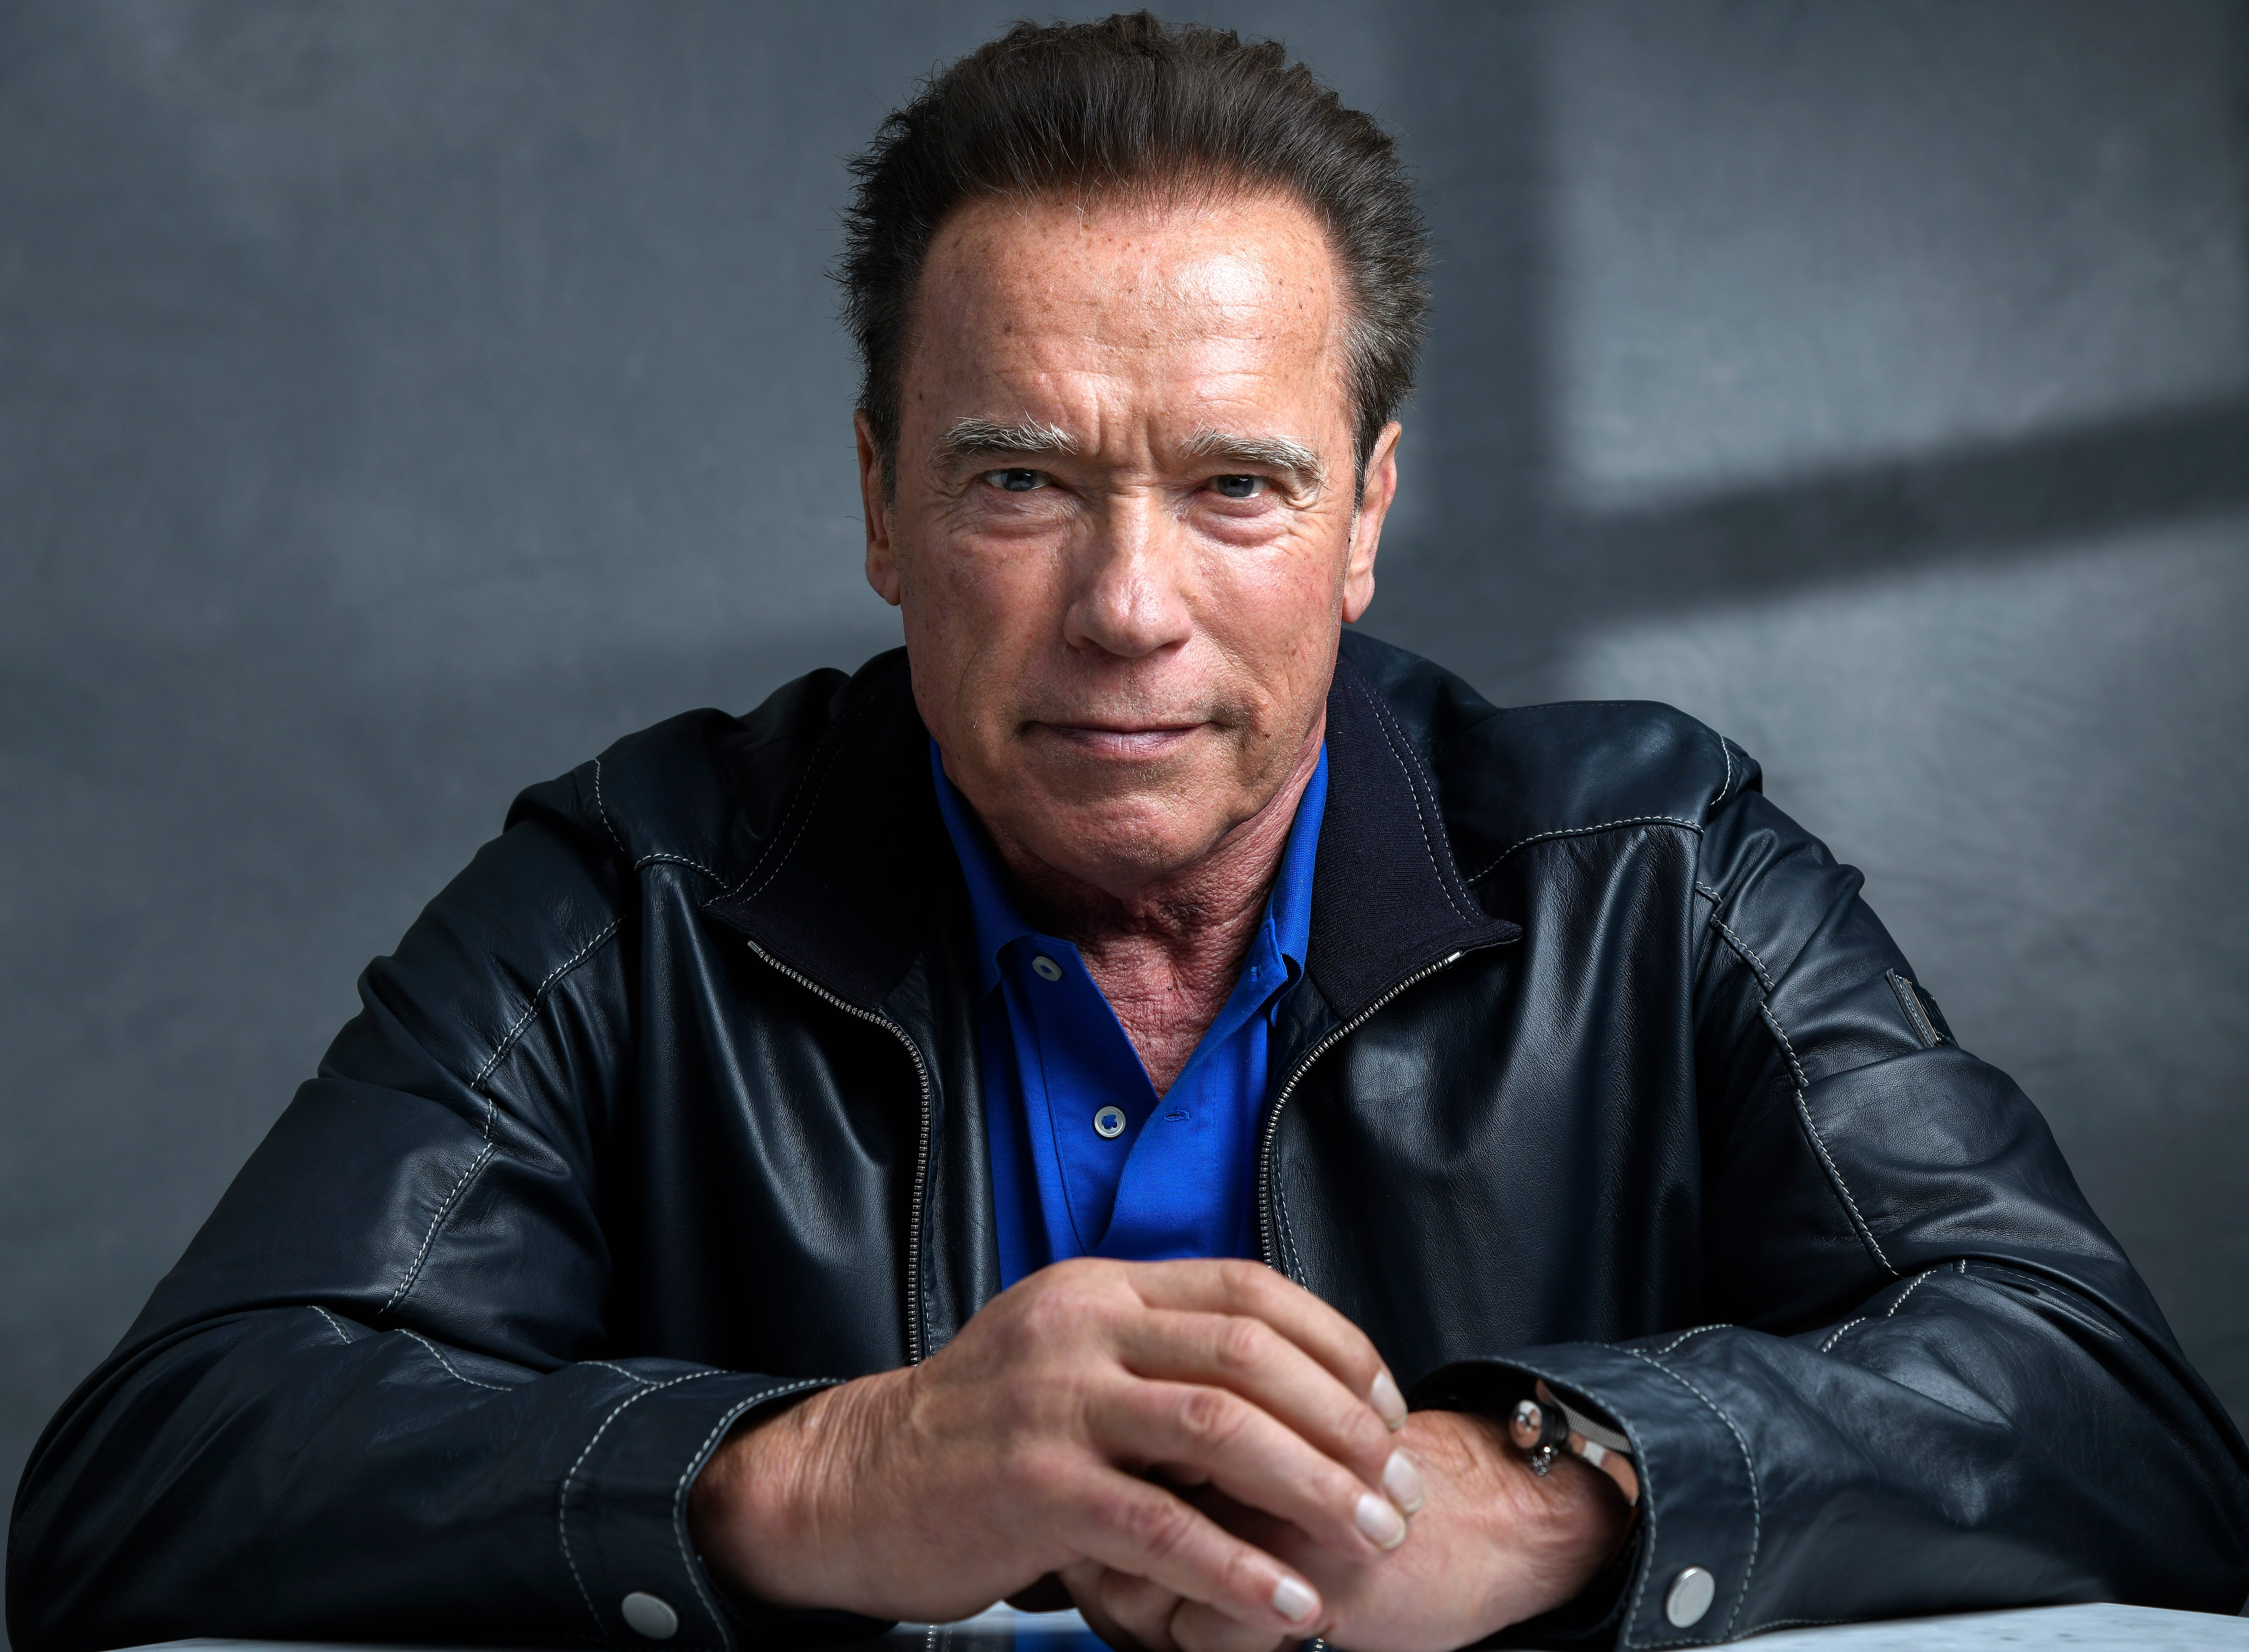 Arnold Schwarzenegger Covid 19 Masks Aren T A Political Issue